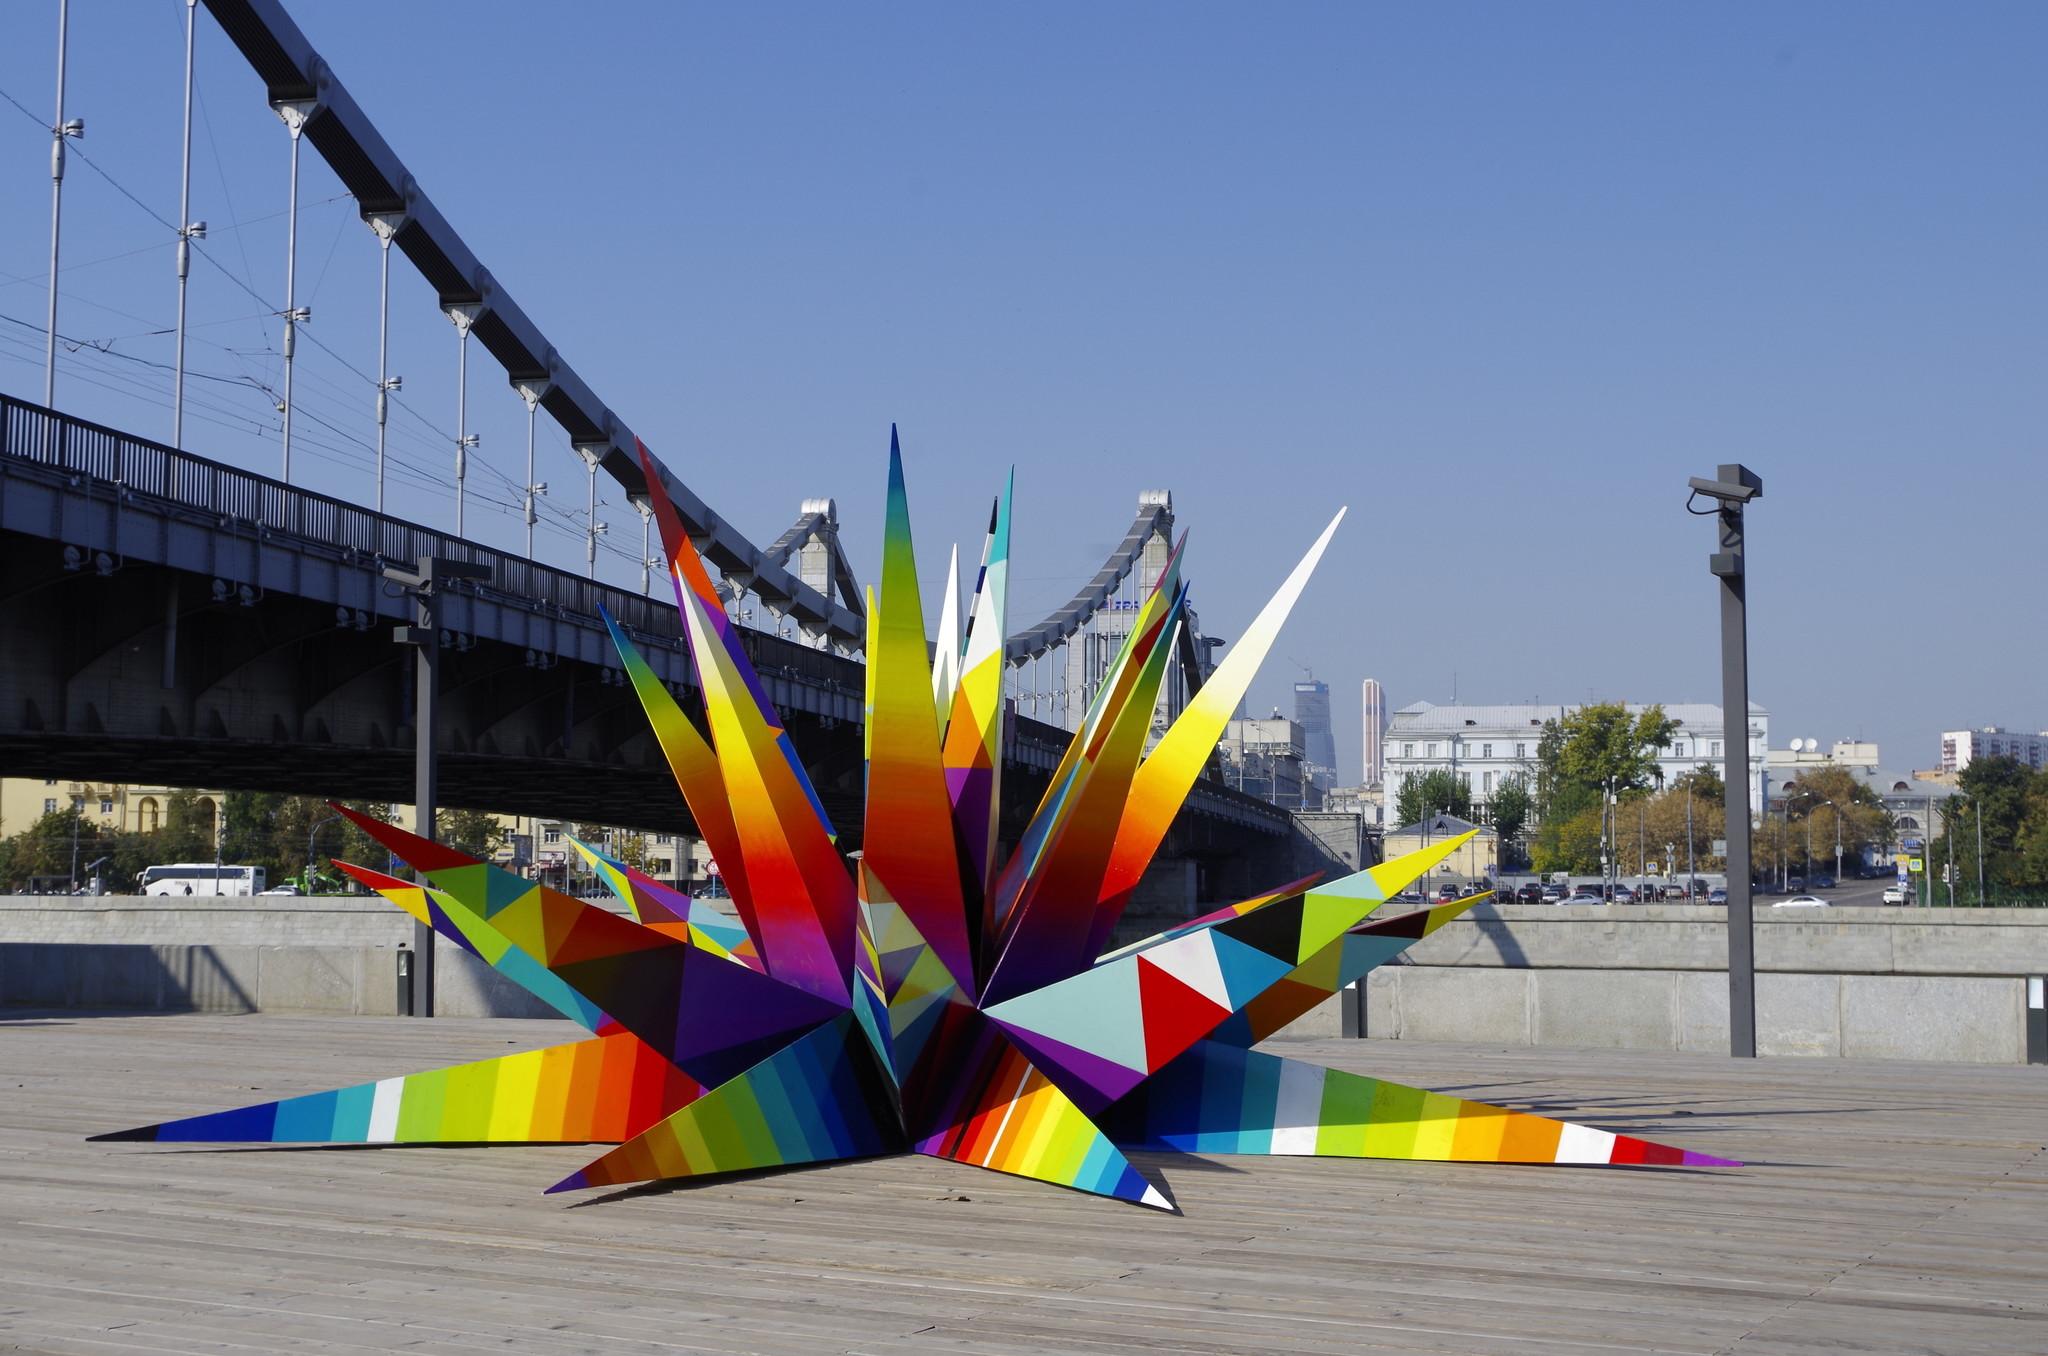 Kaos Star - новая работа Okuda у Крымского моста